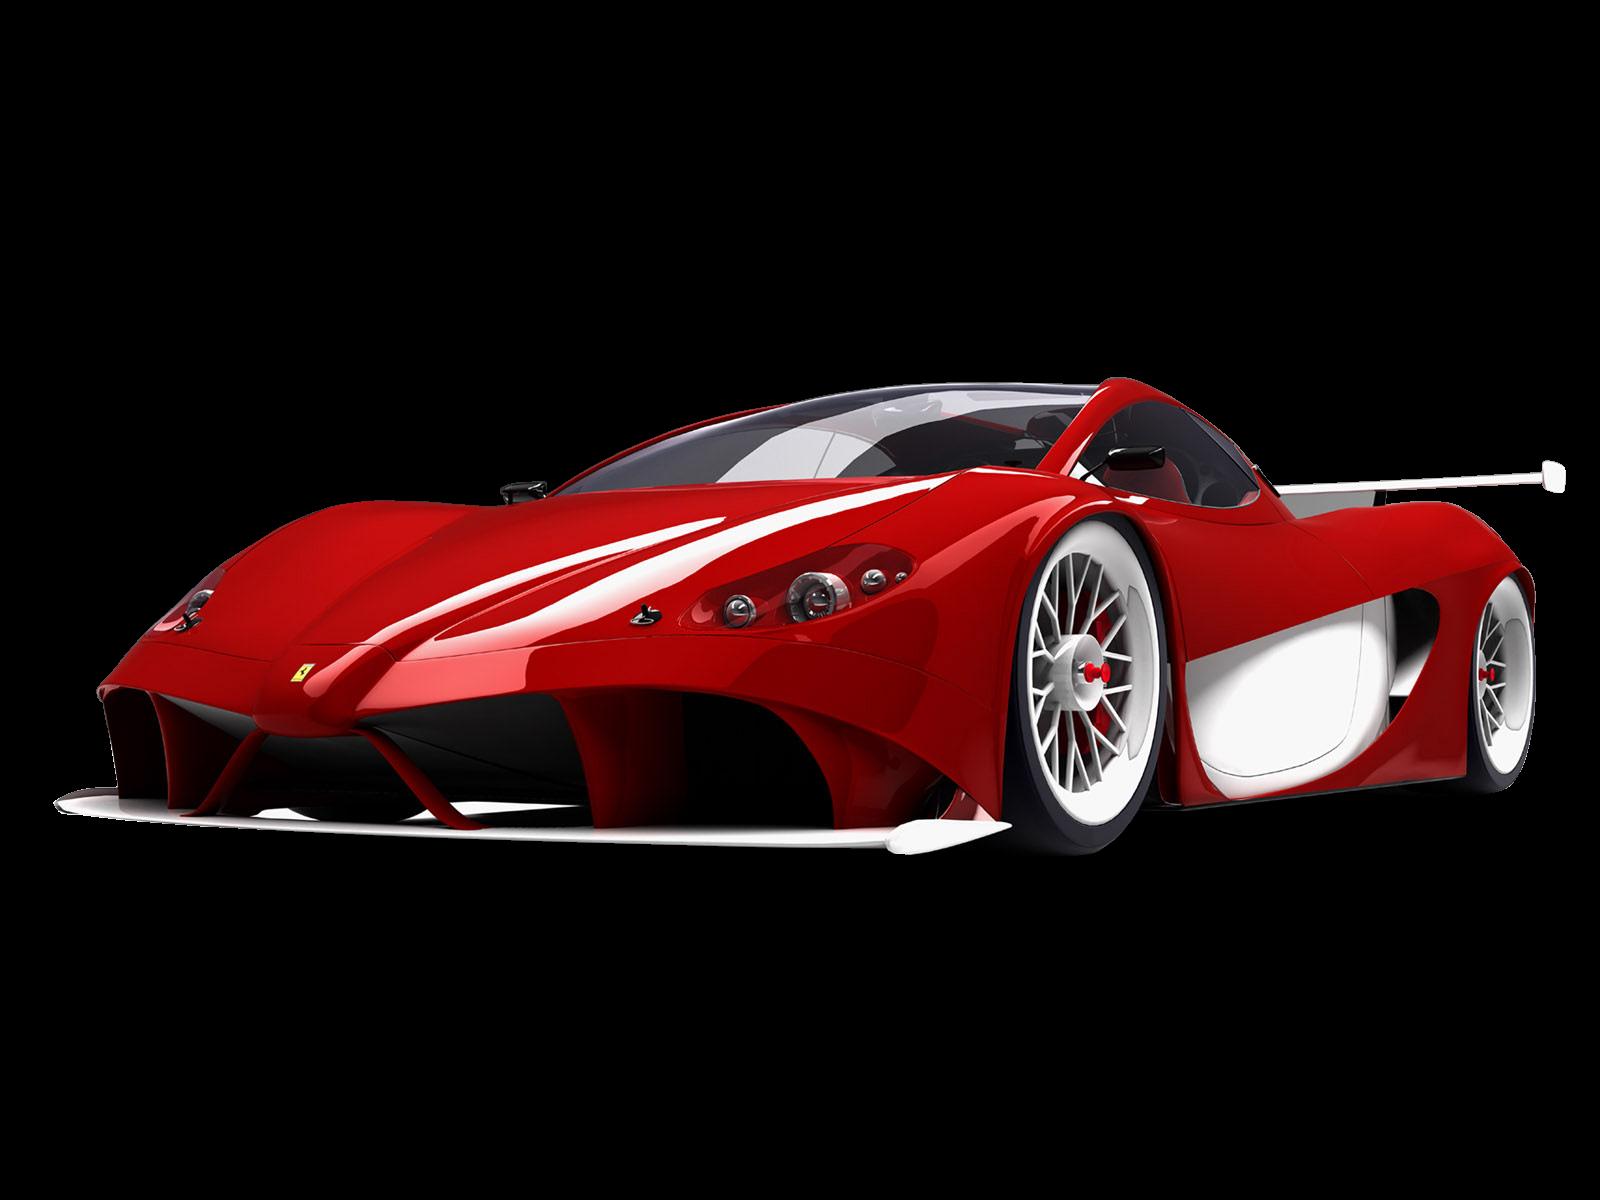 Race Car Png Hd: Memes Designer: Renders Carros -HD